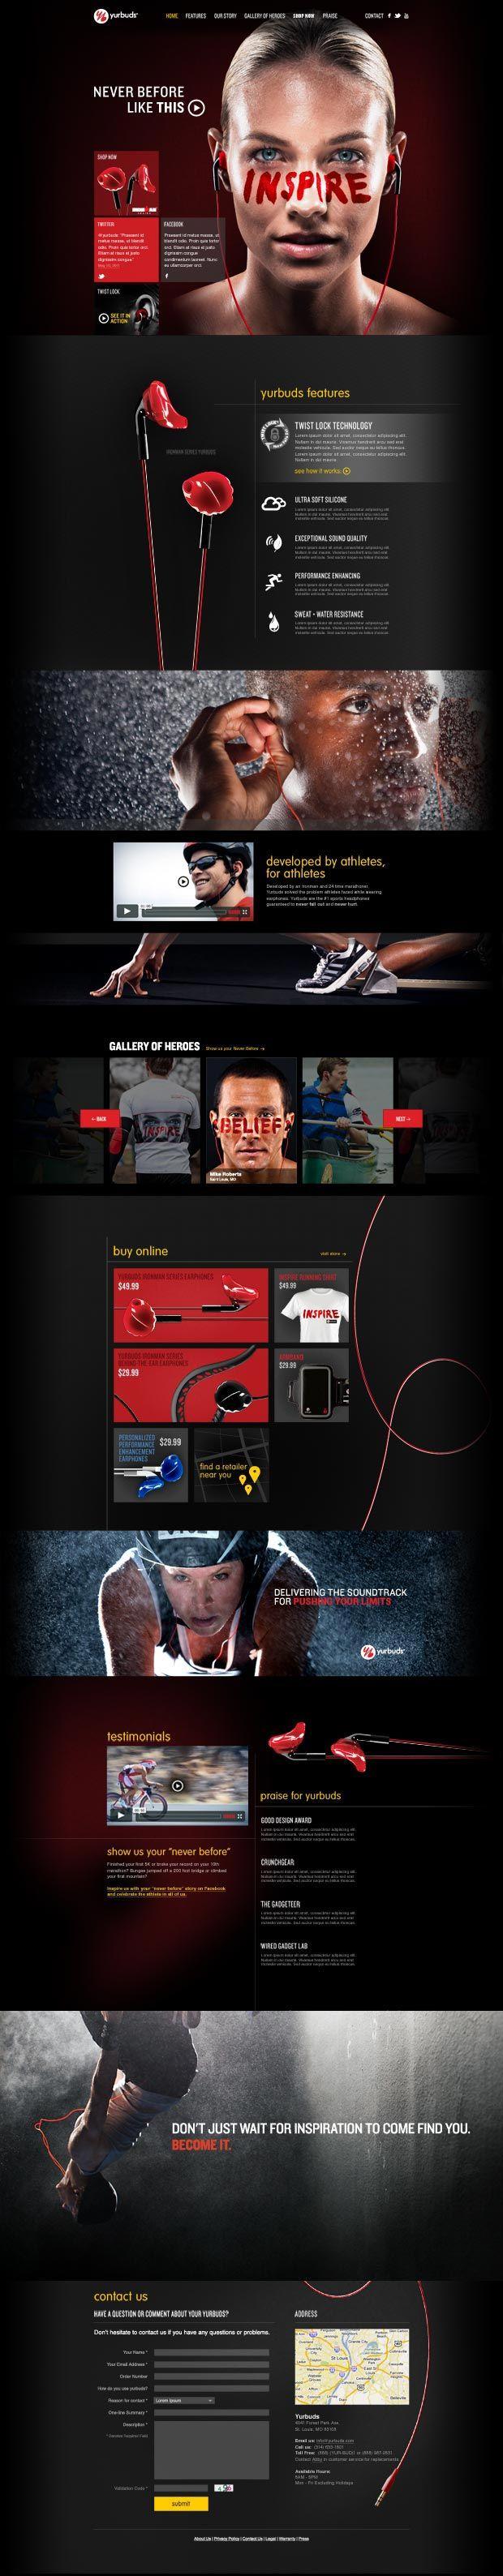 Website Design for Consumer Electronics Brand Yurbuds / Parallax Scroll